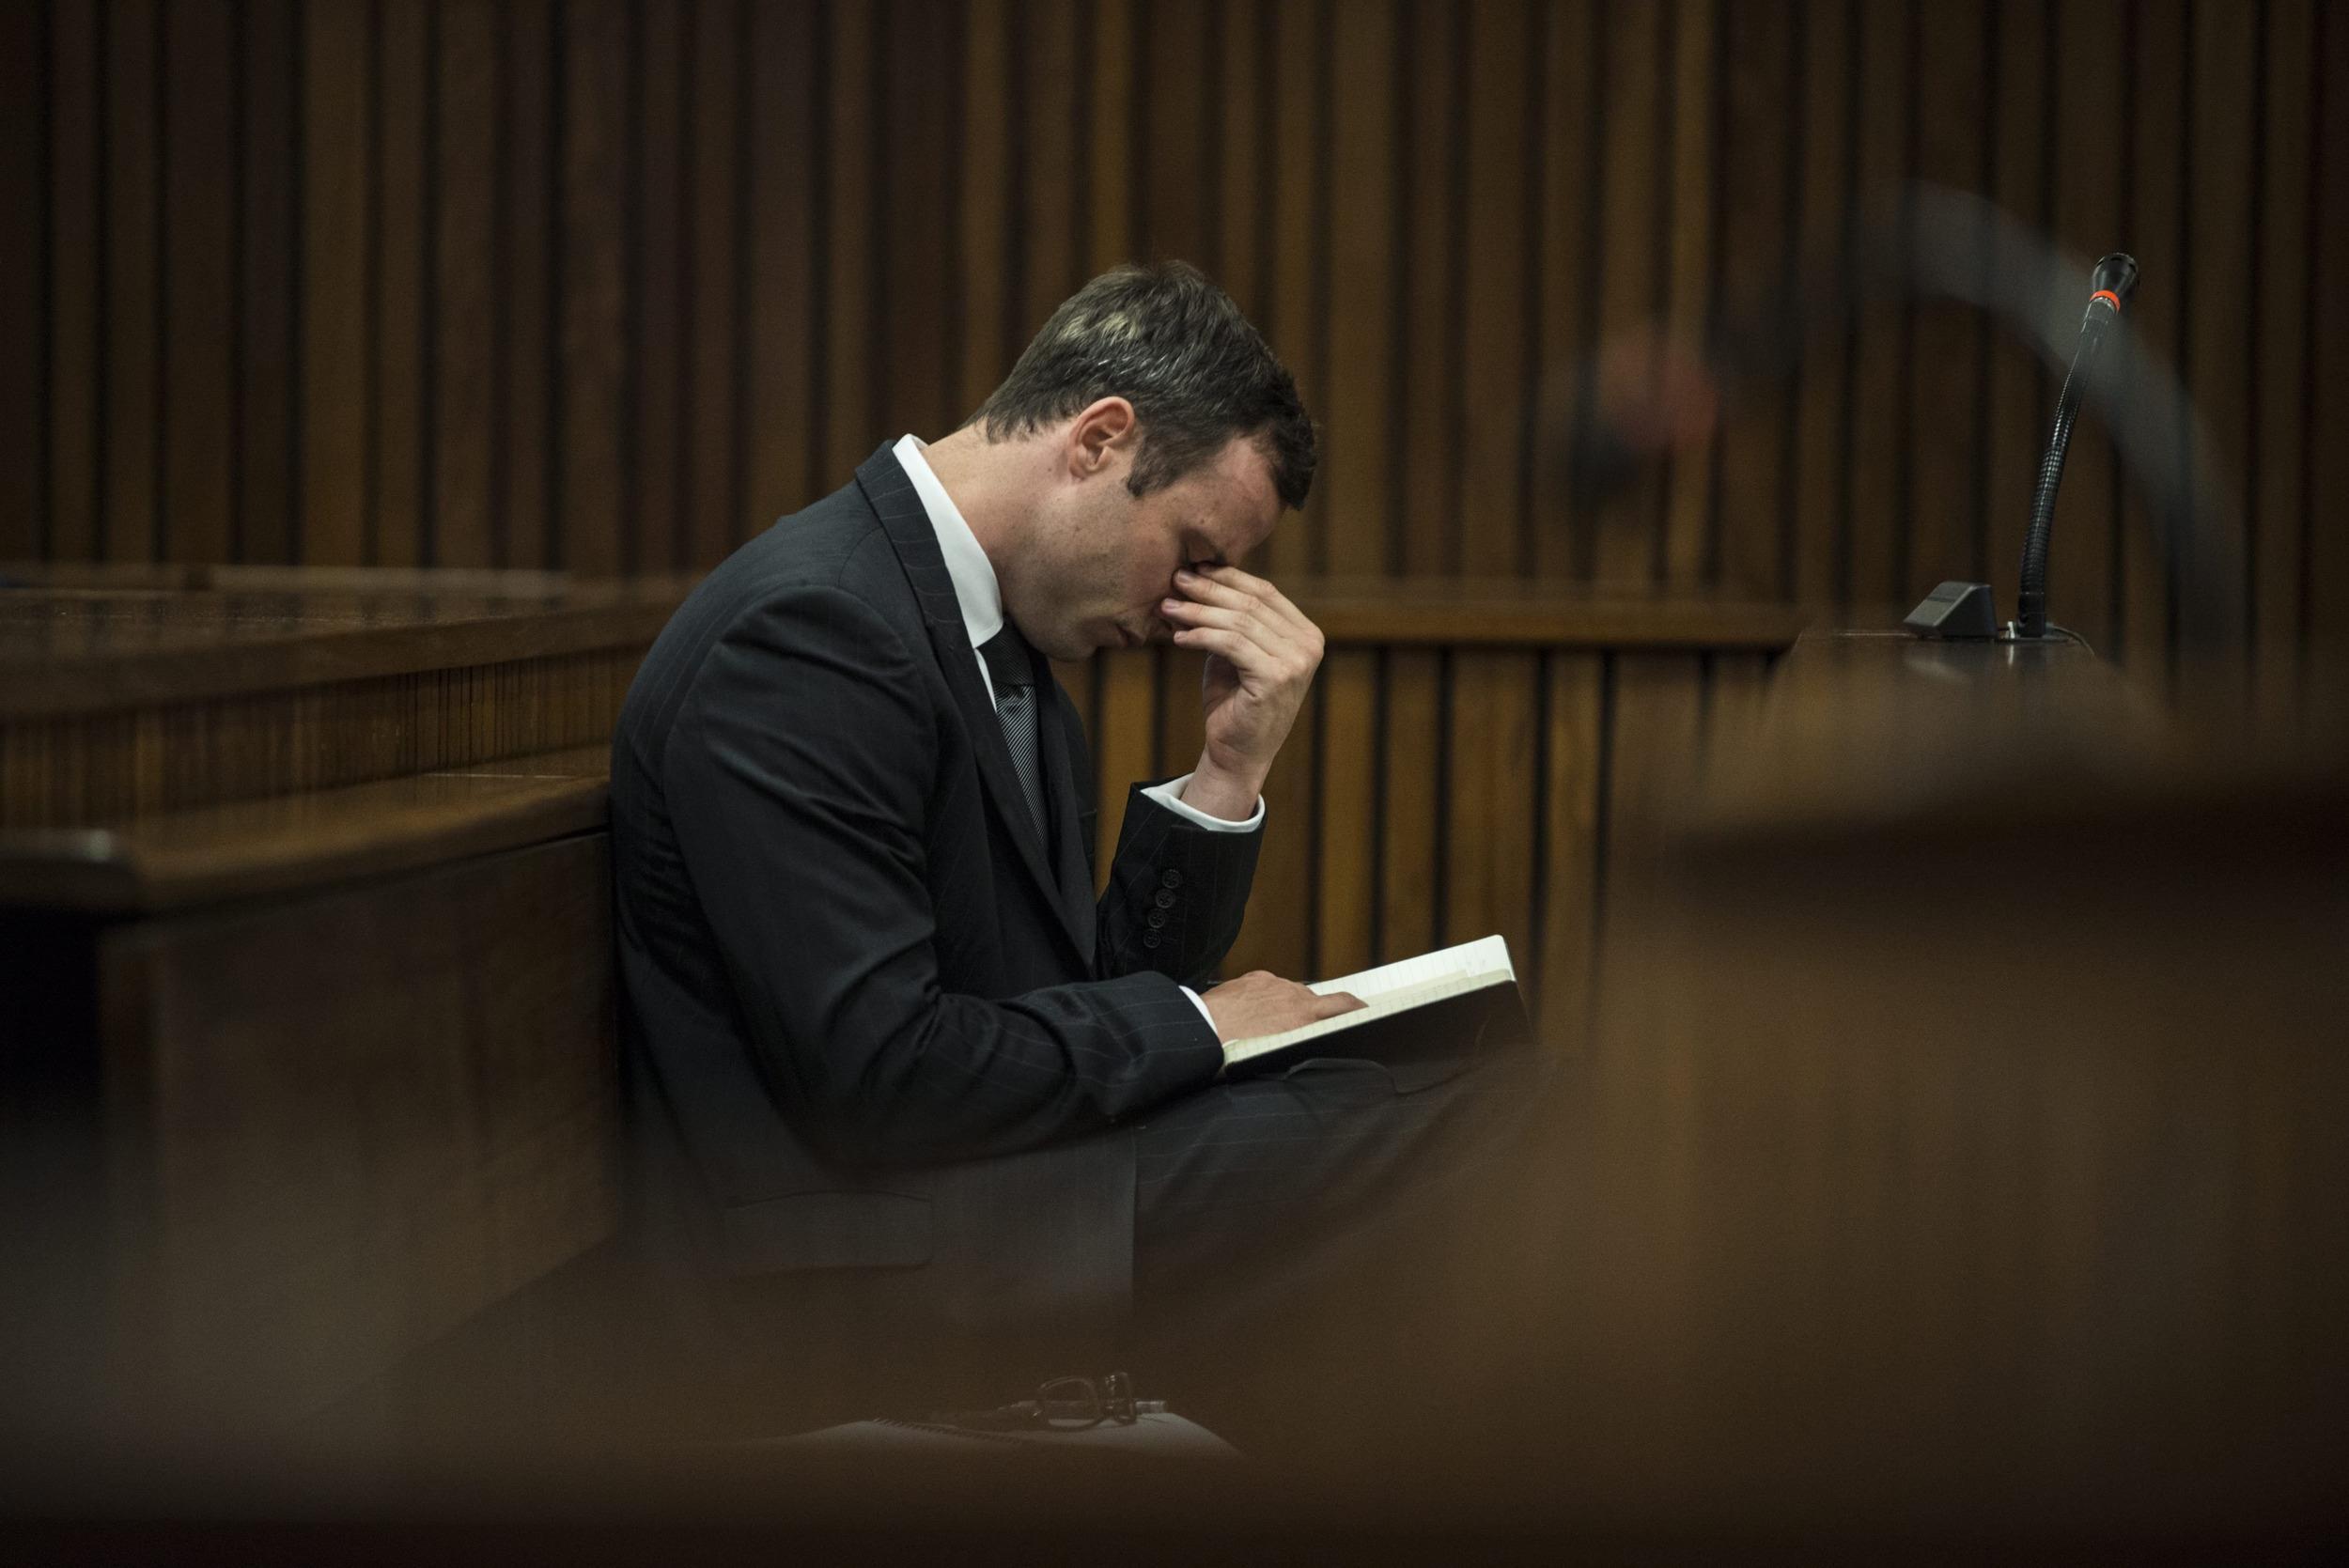 Image: Oscar Pistorius trial